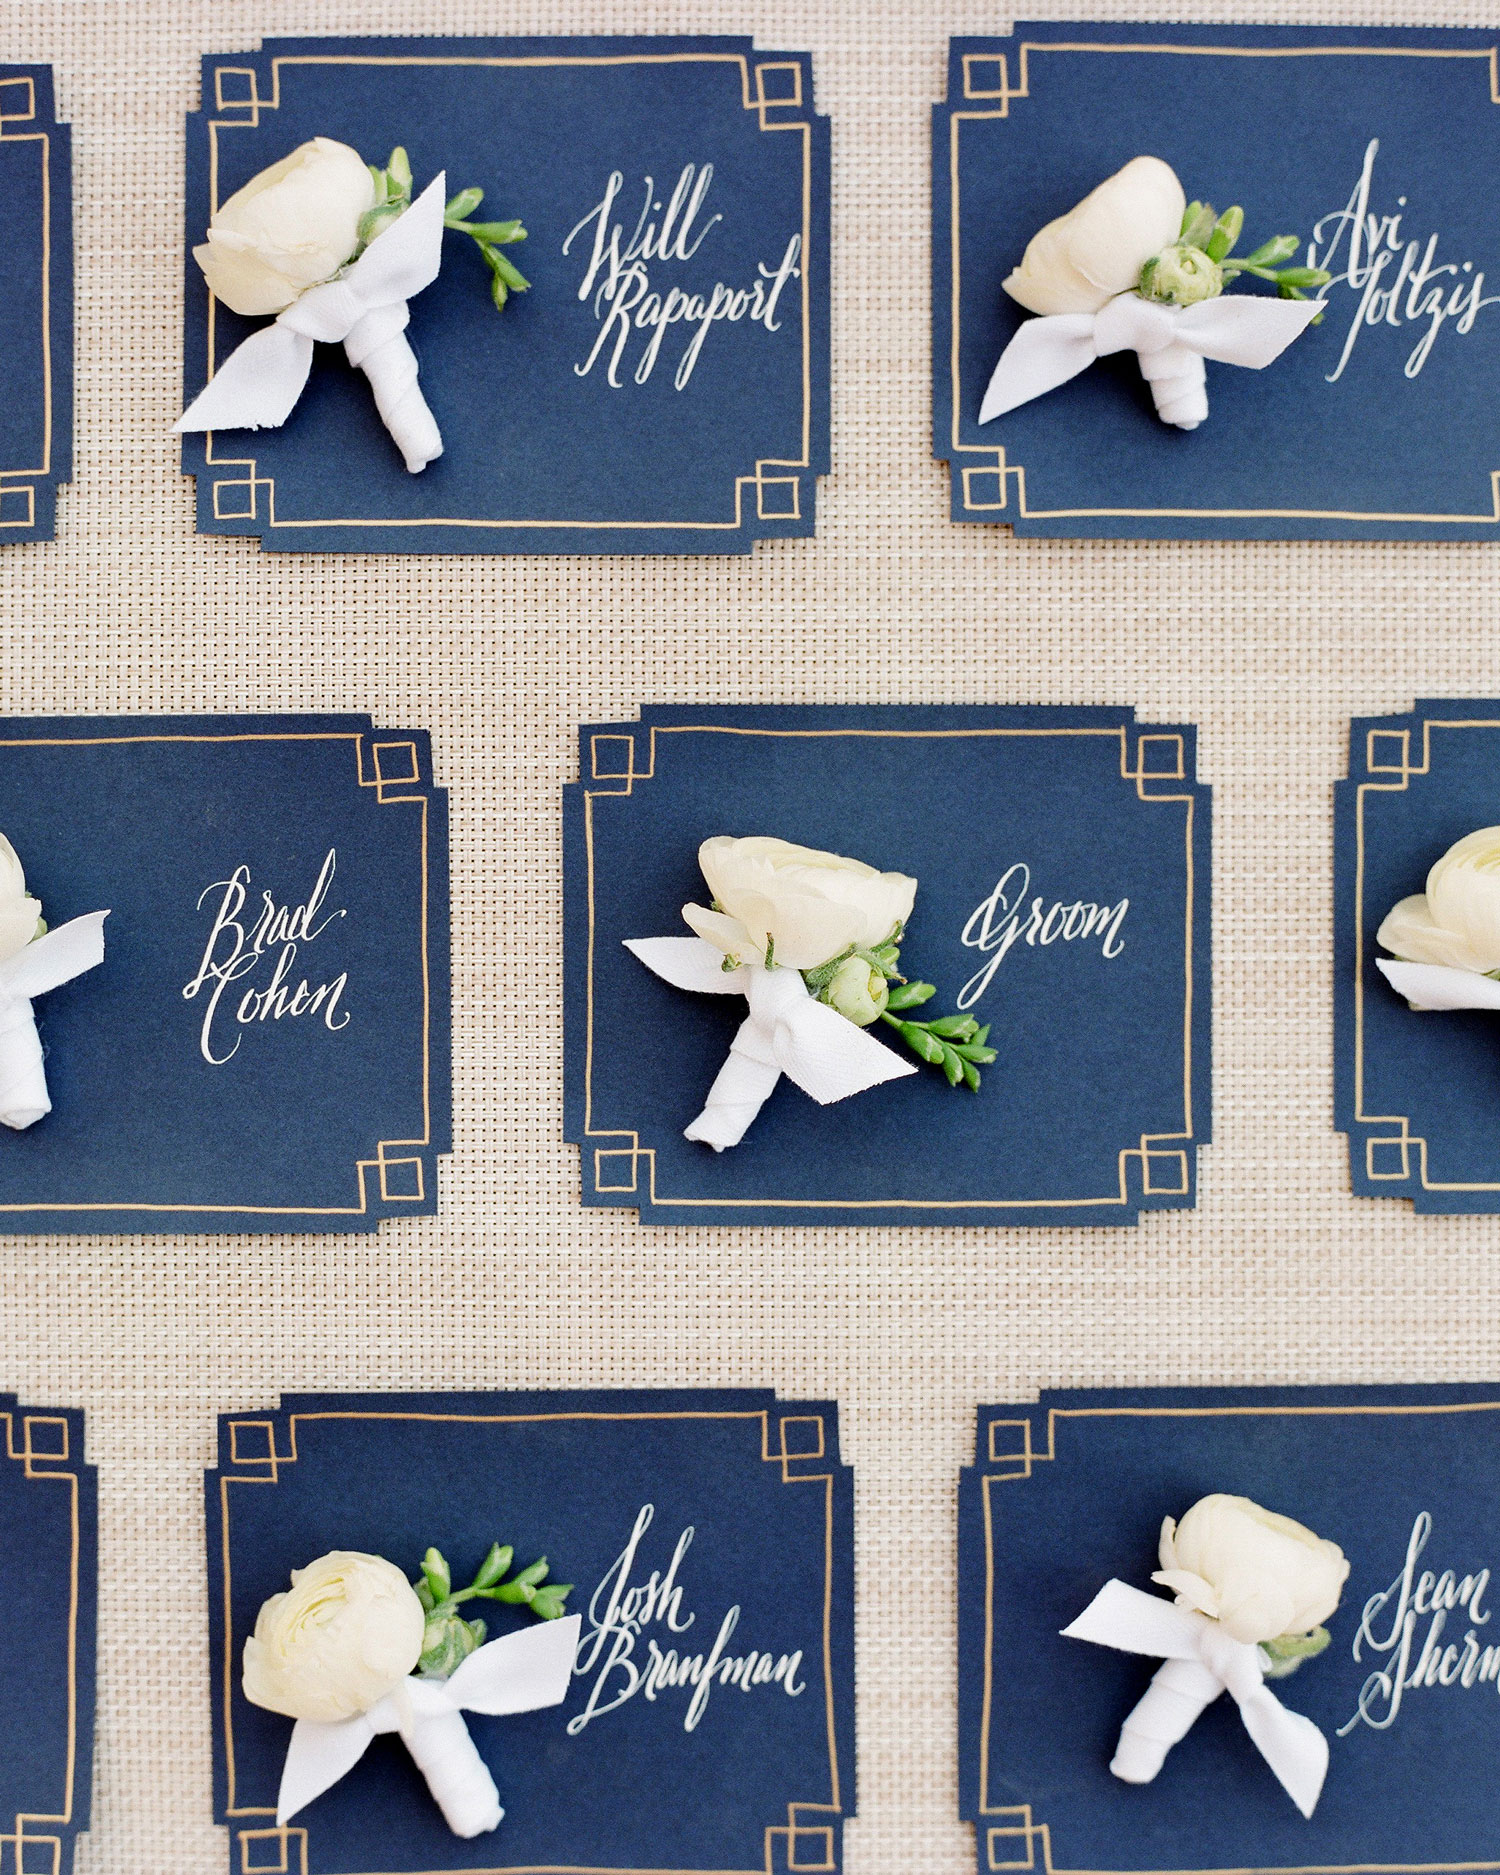 tali-mike-wedding-california-boutonnieres-58500008-s112346.jpg